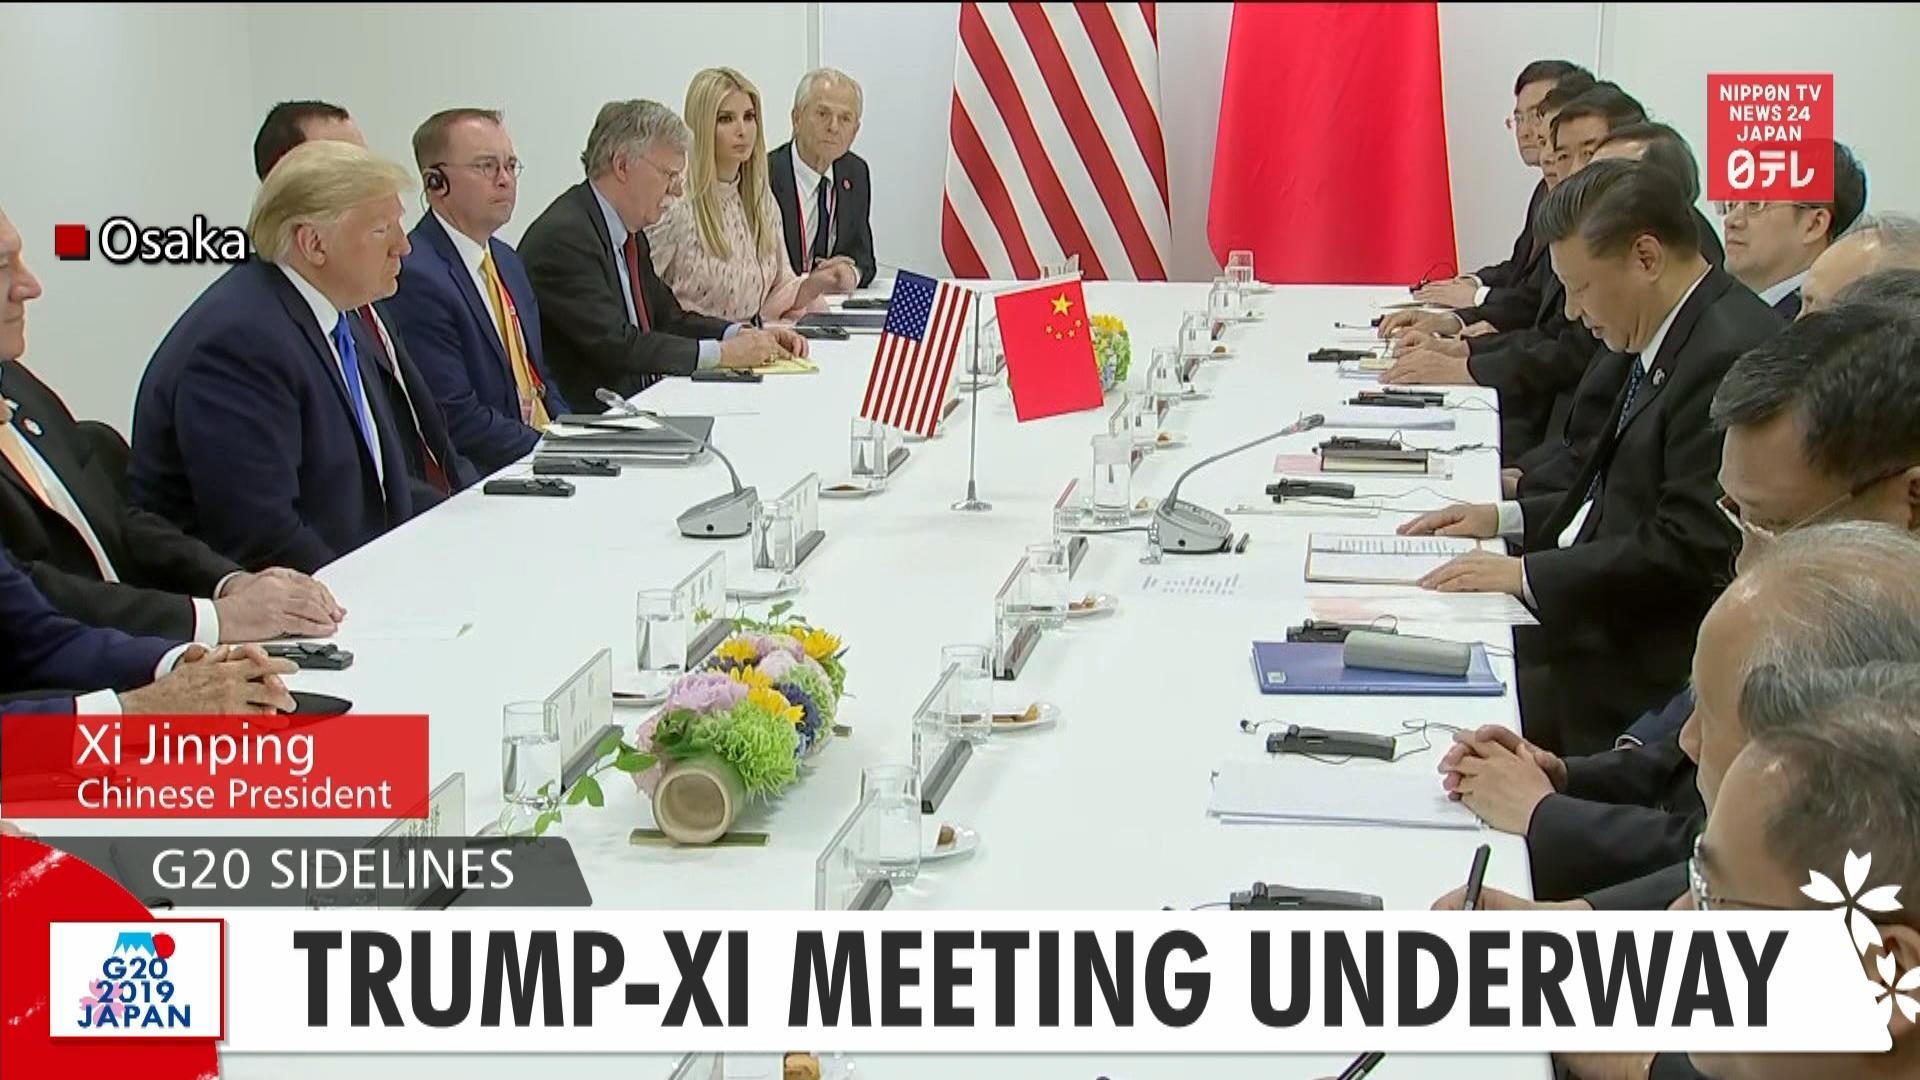 G20: Trump-Xi meeting underway